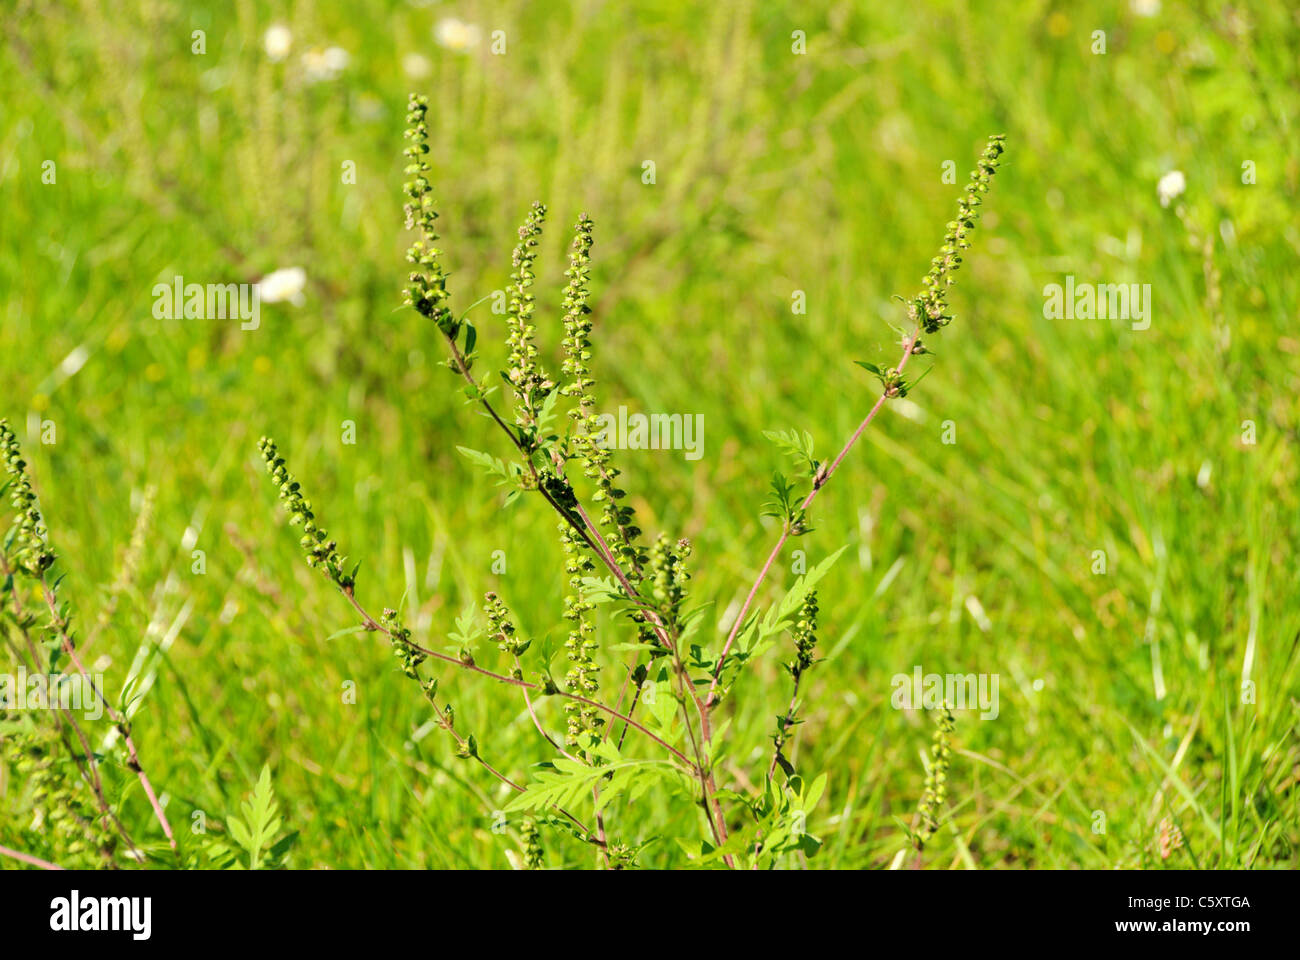 Ambrosia - Common Ragweed 06 Stock Photo